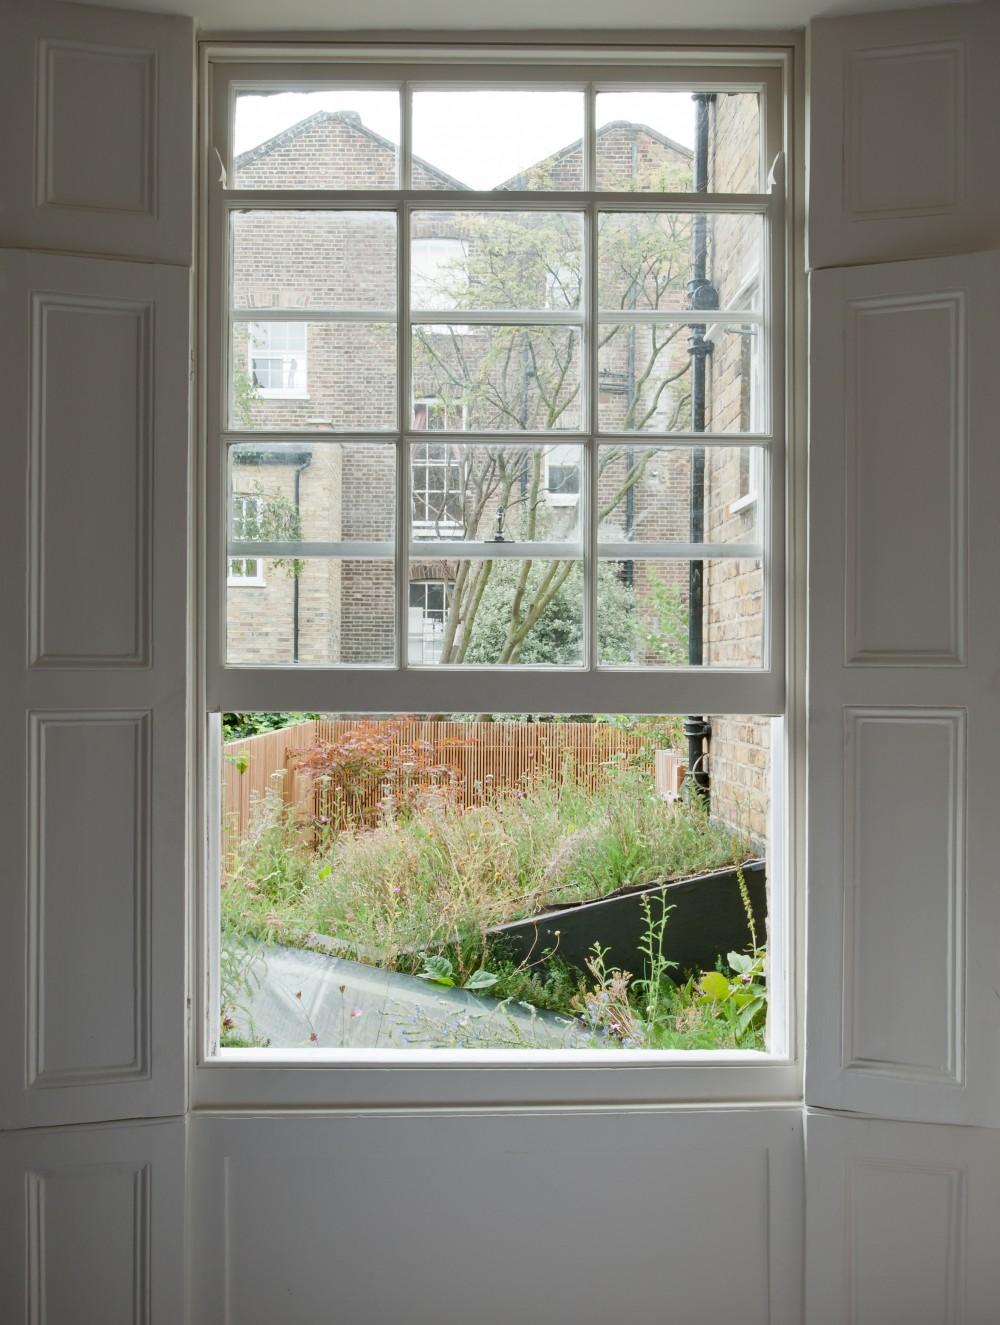 The-jewel-box-0009-Rear-bedroom-window-1000x1325.jpg